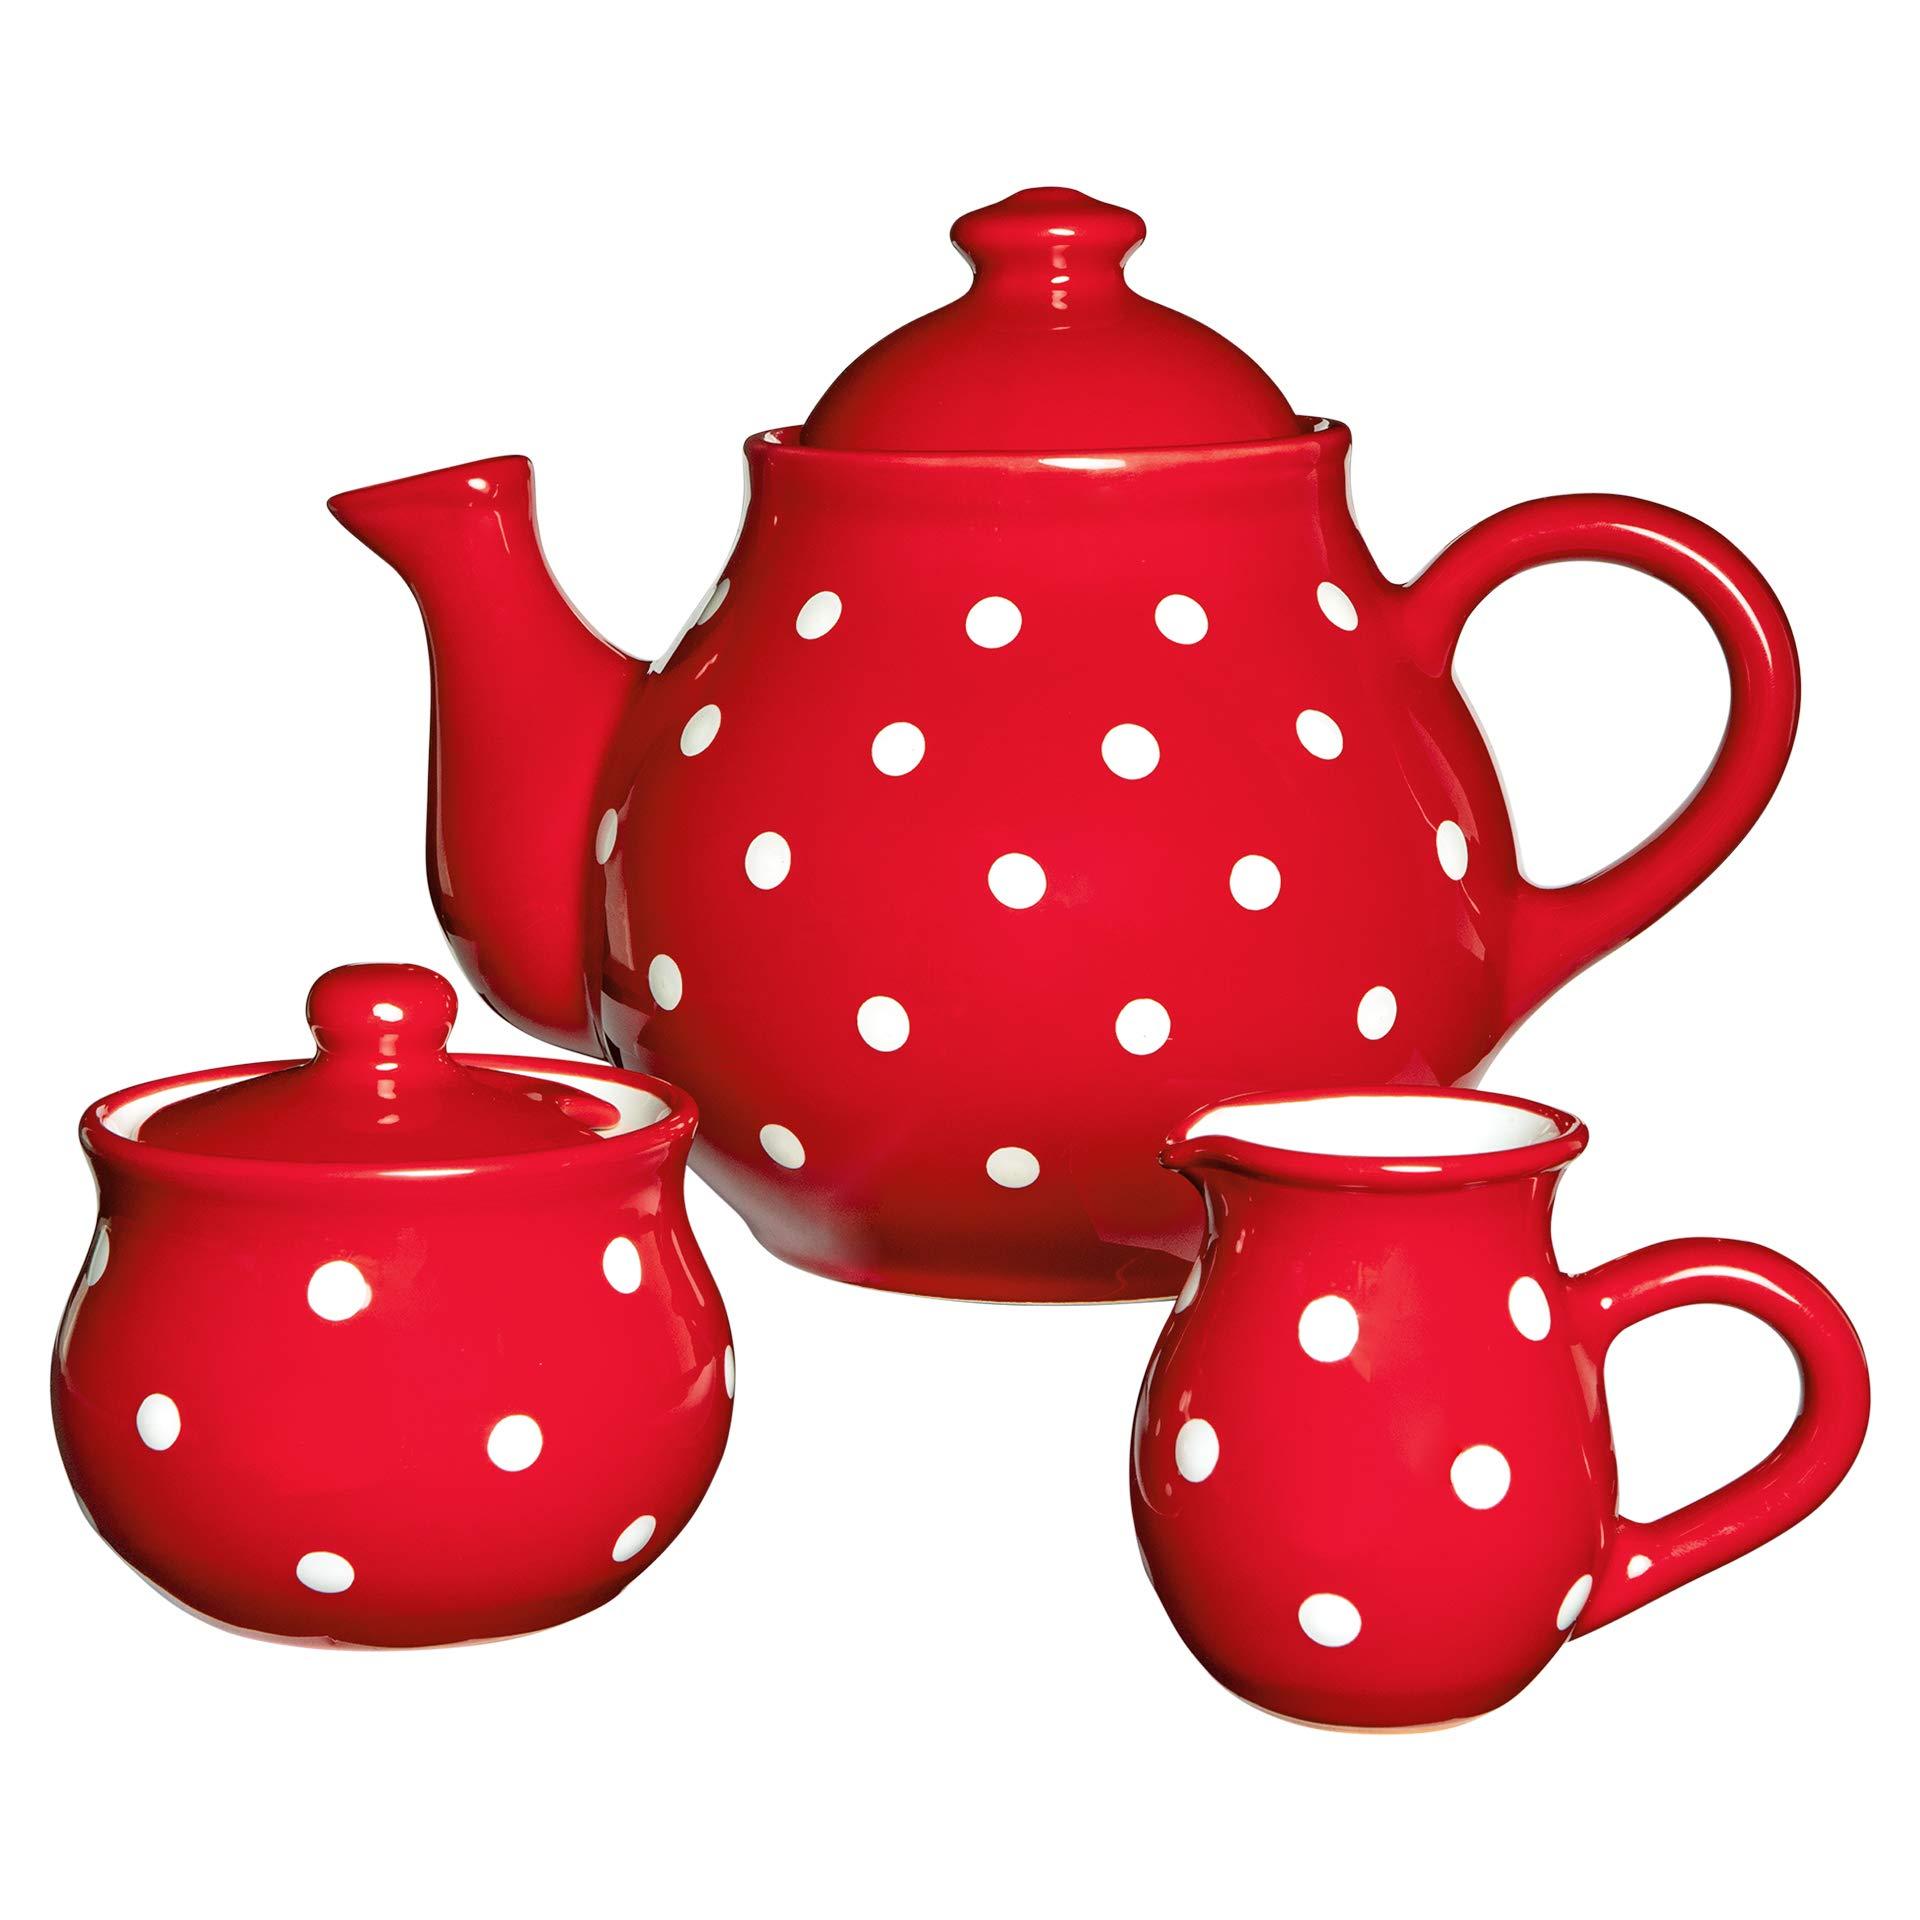 City to Cottage Handmade Red and White Polka Dot Large Ceramic 1,7l/60oz/4-6 Cup Teapot, Milk Jug, Sugar Bowl Set, Pottery Tea Set, Housewarming Gift for Tea Lovers